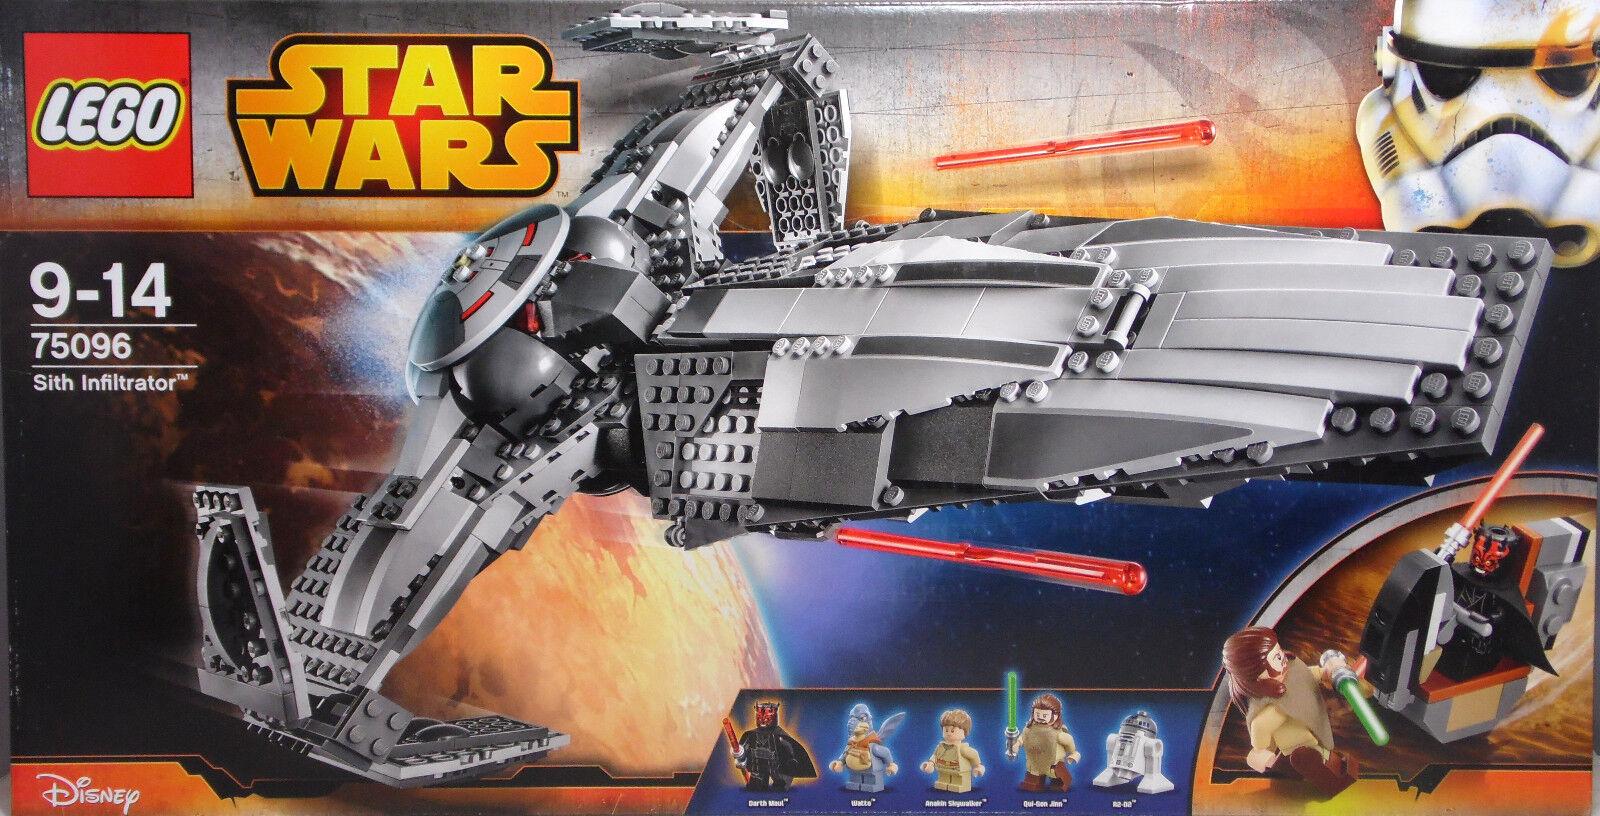 Lego Star Wars 75096 Sith Infiltrator Darth Maul Watto Watto Watto Anakin R2-D2 SEALED NEU 6027b1